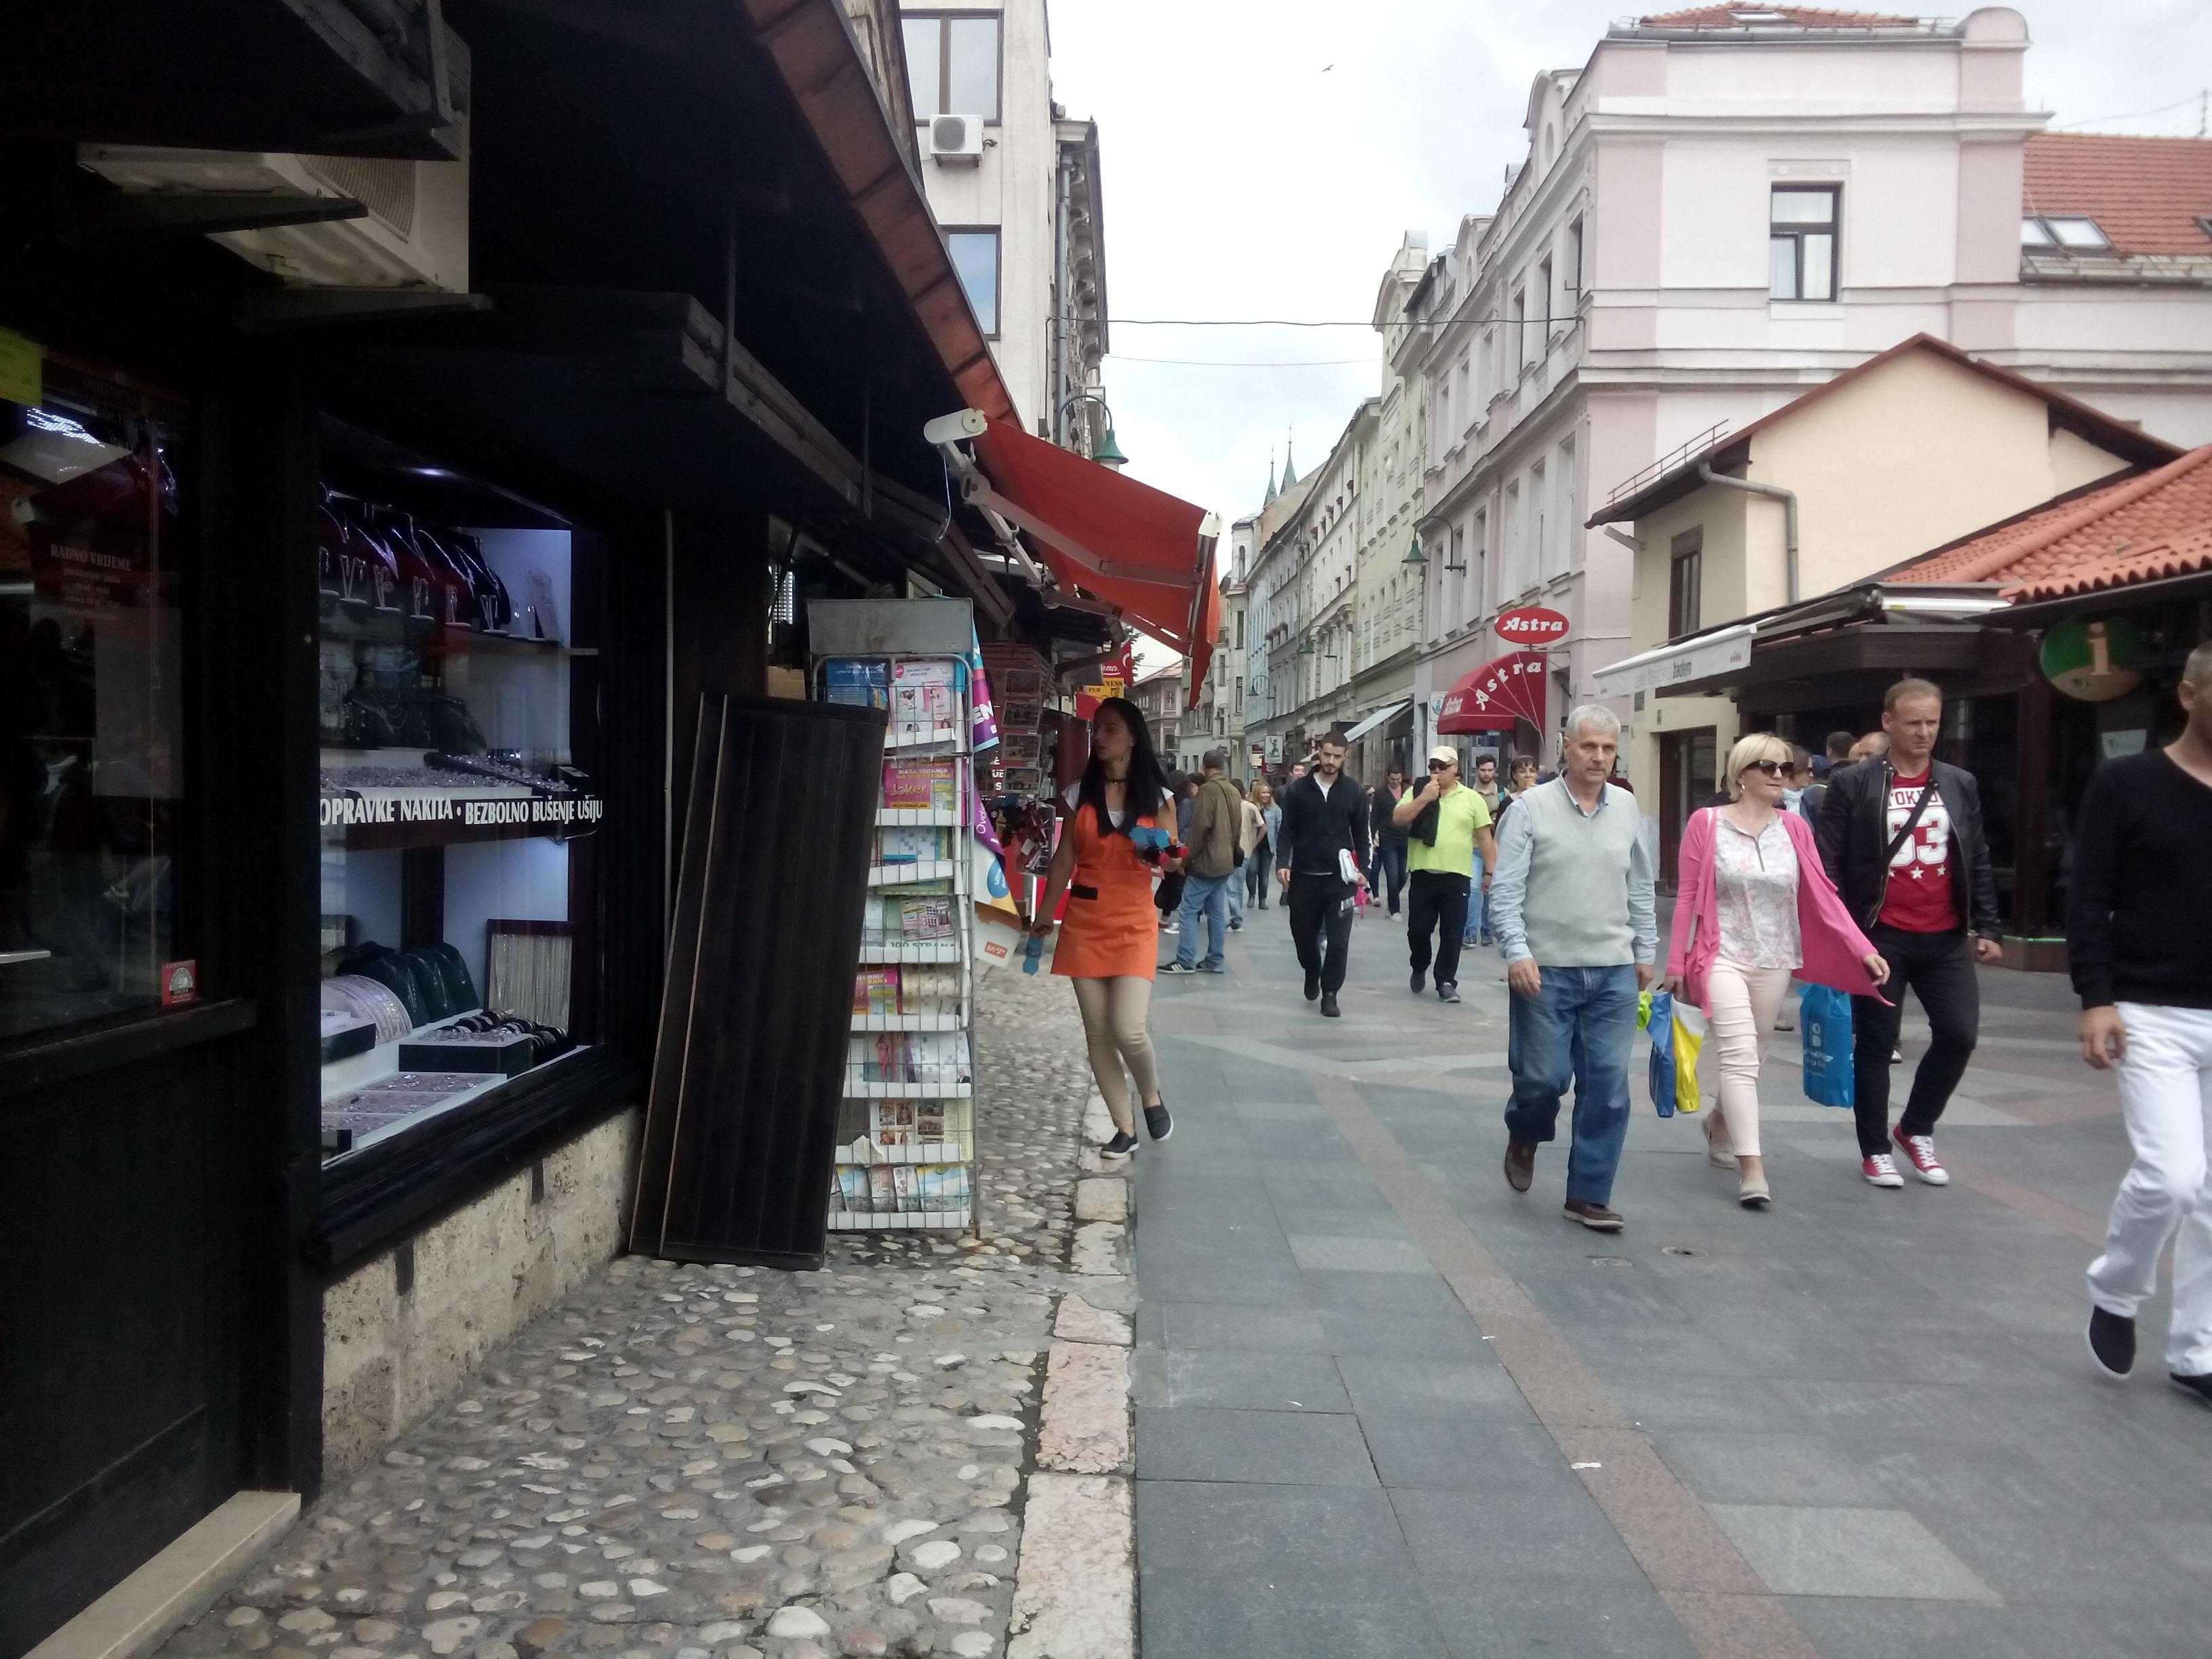 https://i.amy.gy/2017-sarajevo/IMG_20170617_151215.jpg